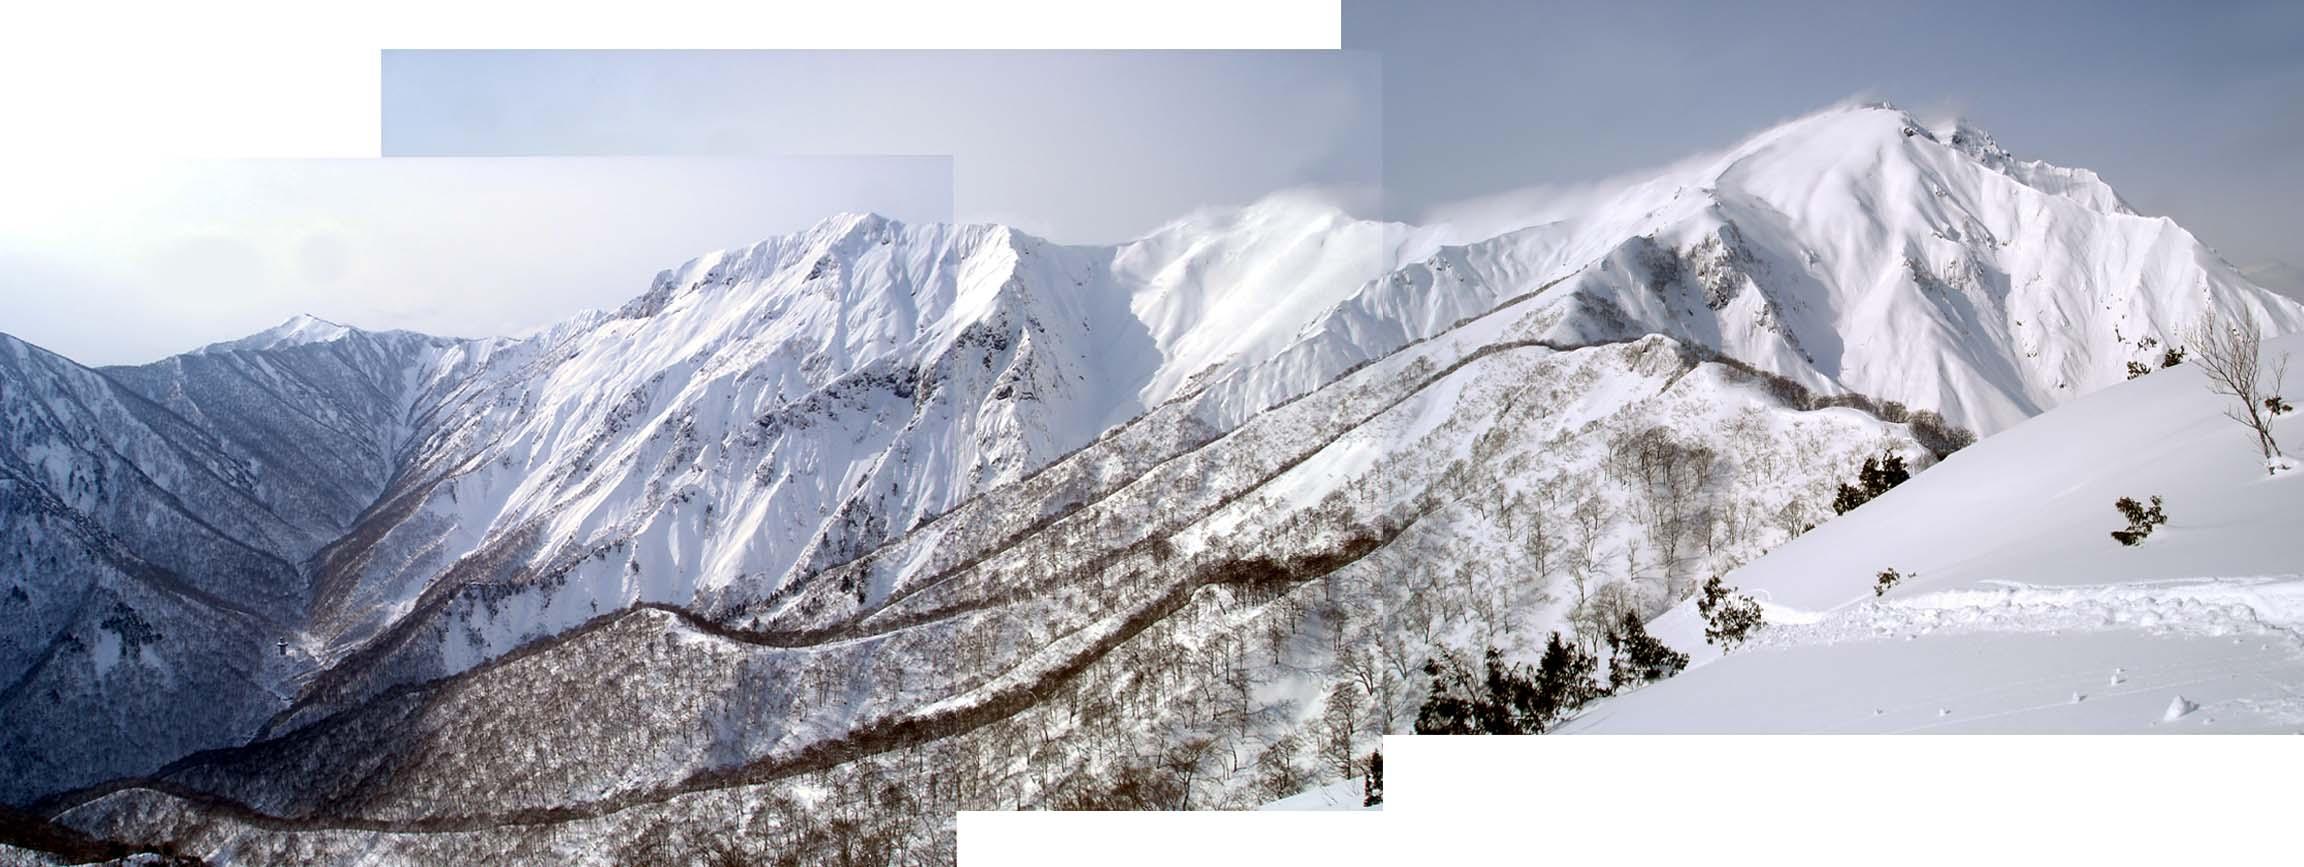 関東ブロック雪崩講習会⑱ 俎~谷川岳